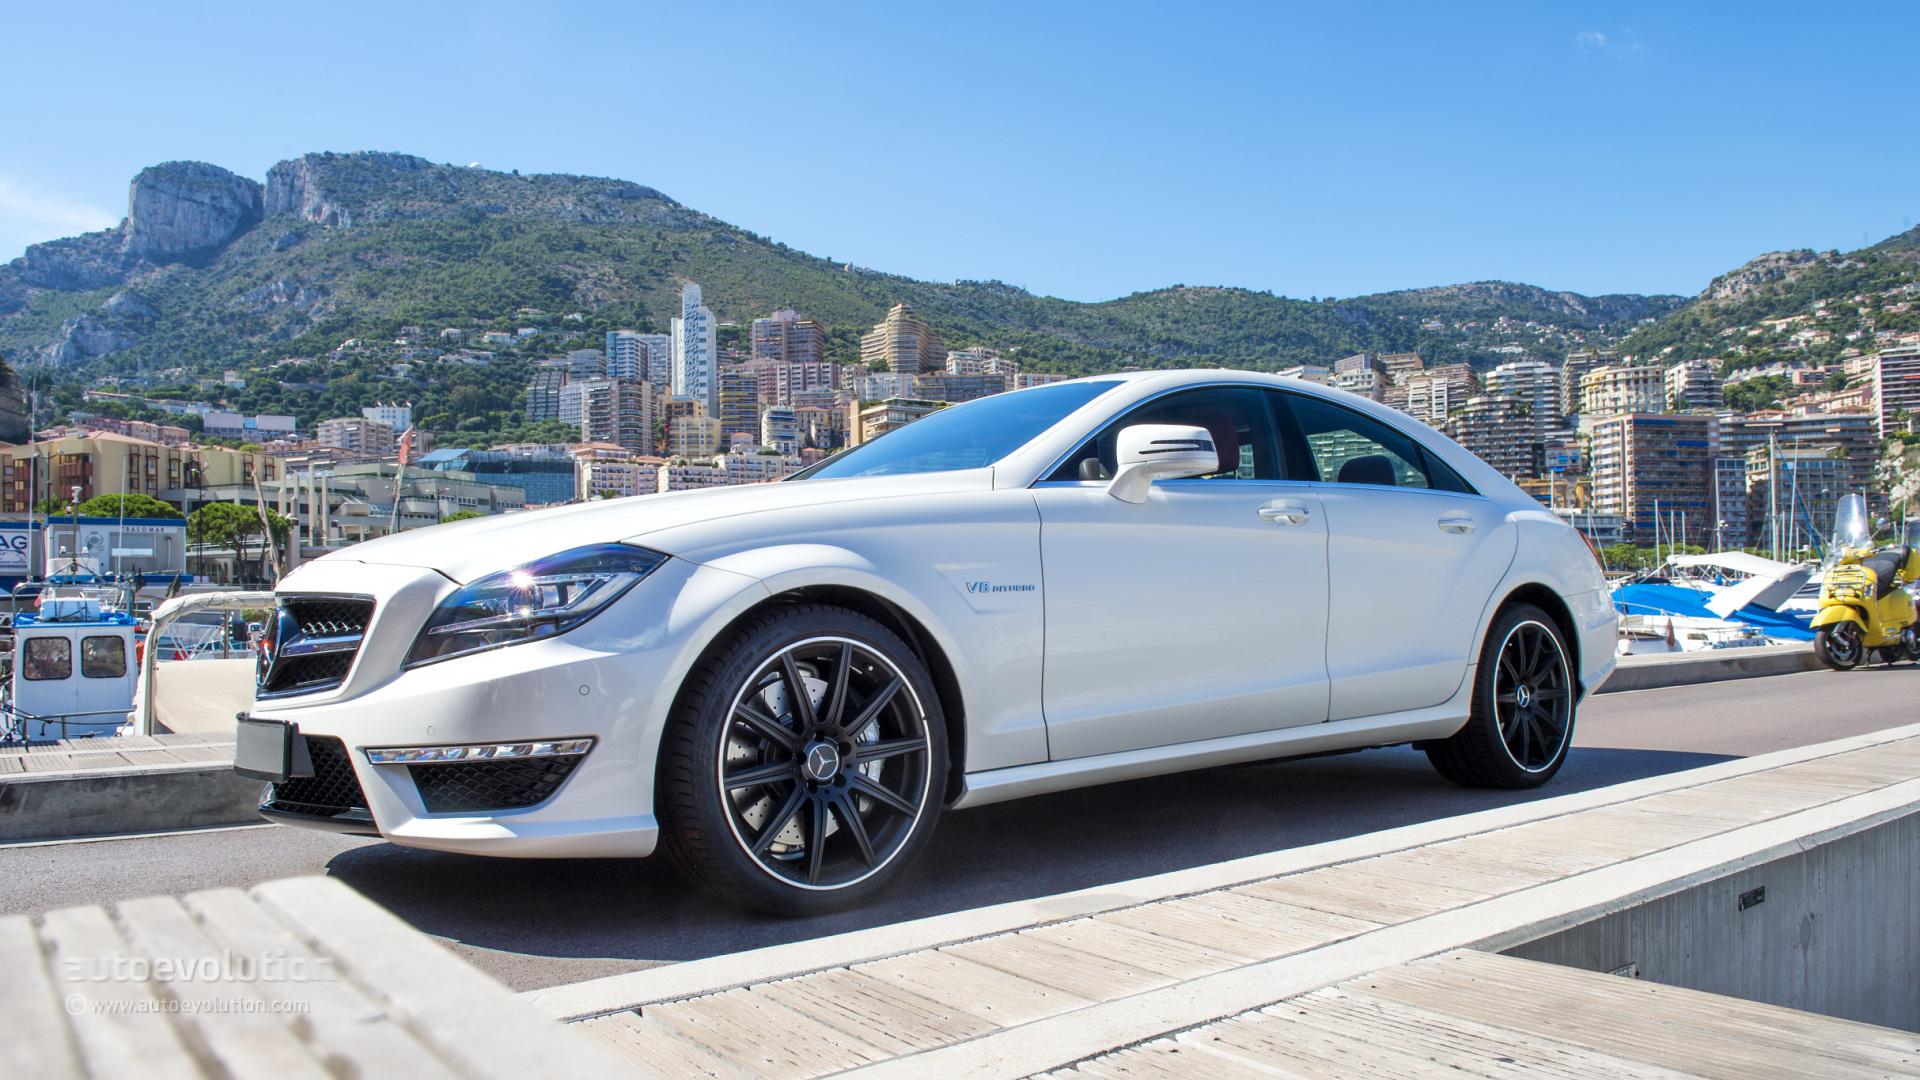 2014 mercedes benz cls63 amg 4matic review autoevolution for Mercedes benz cls63